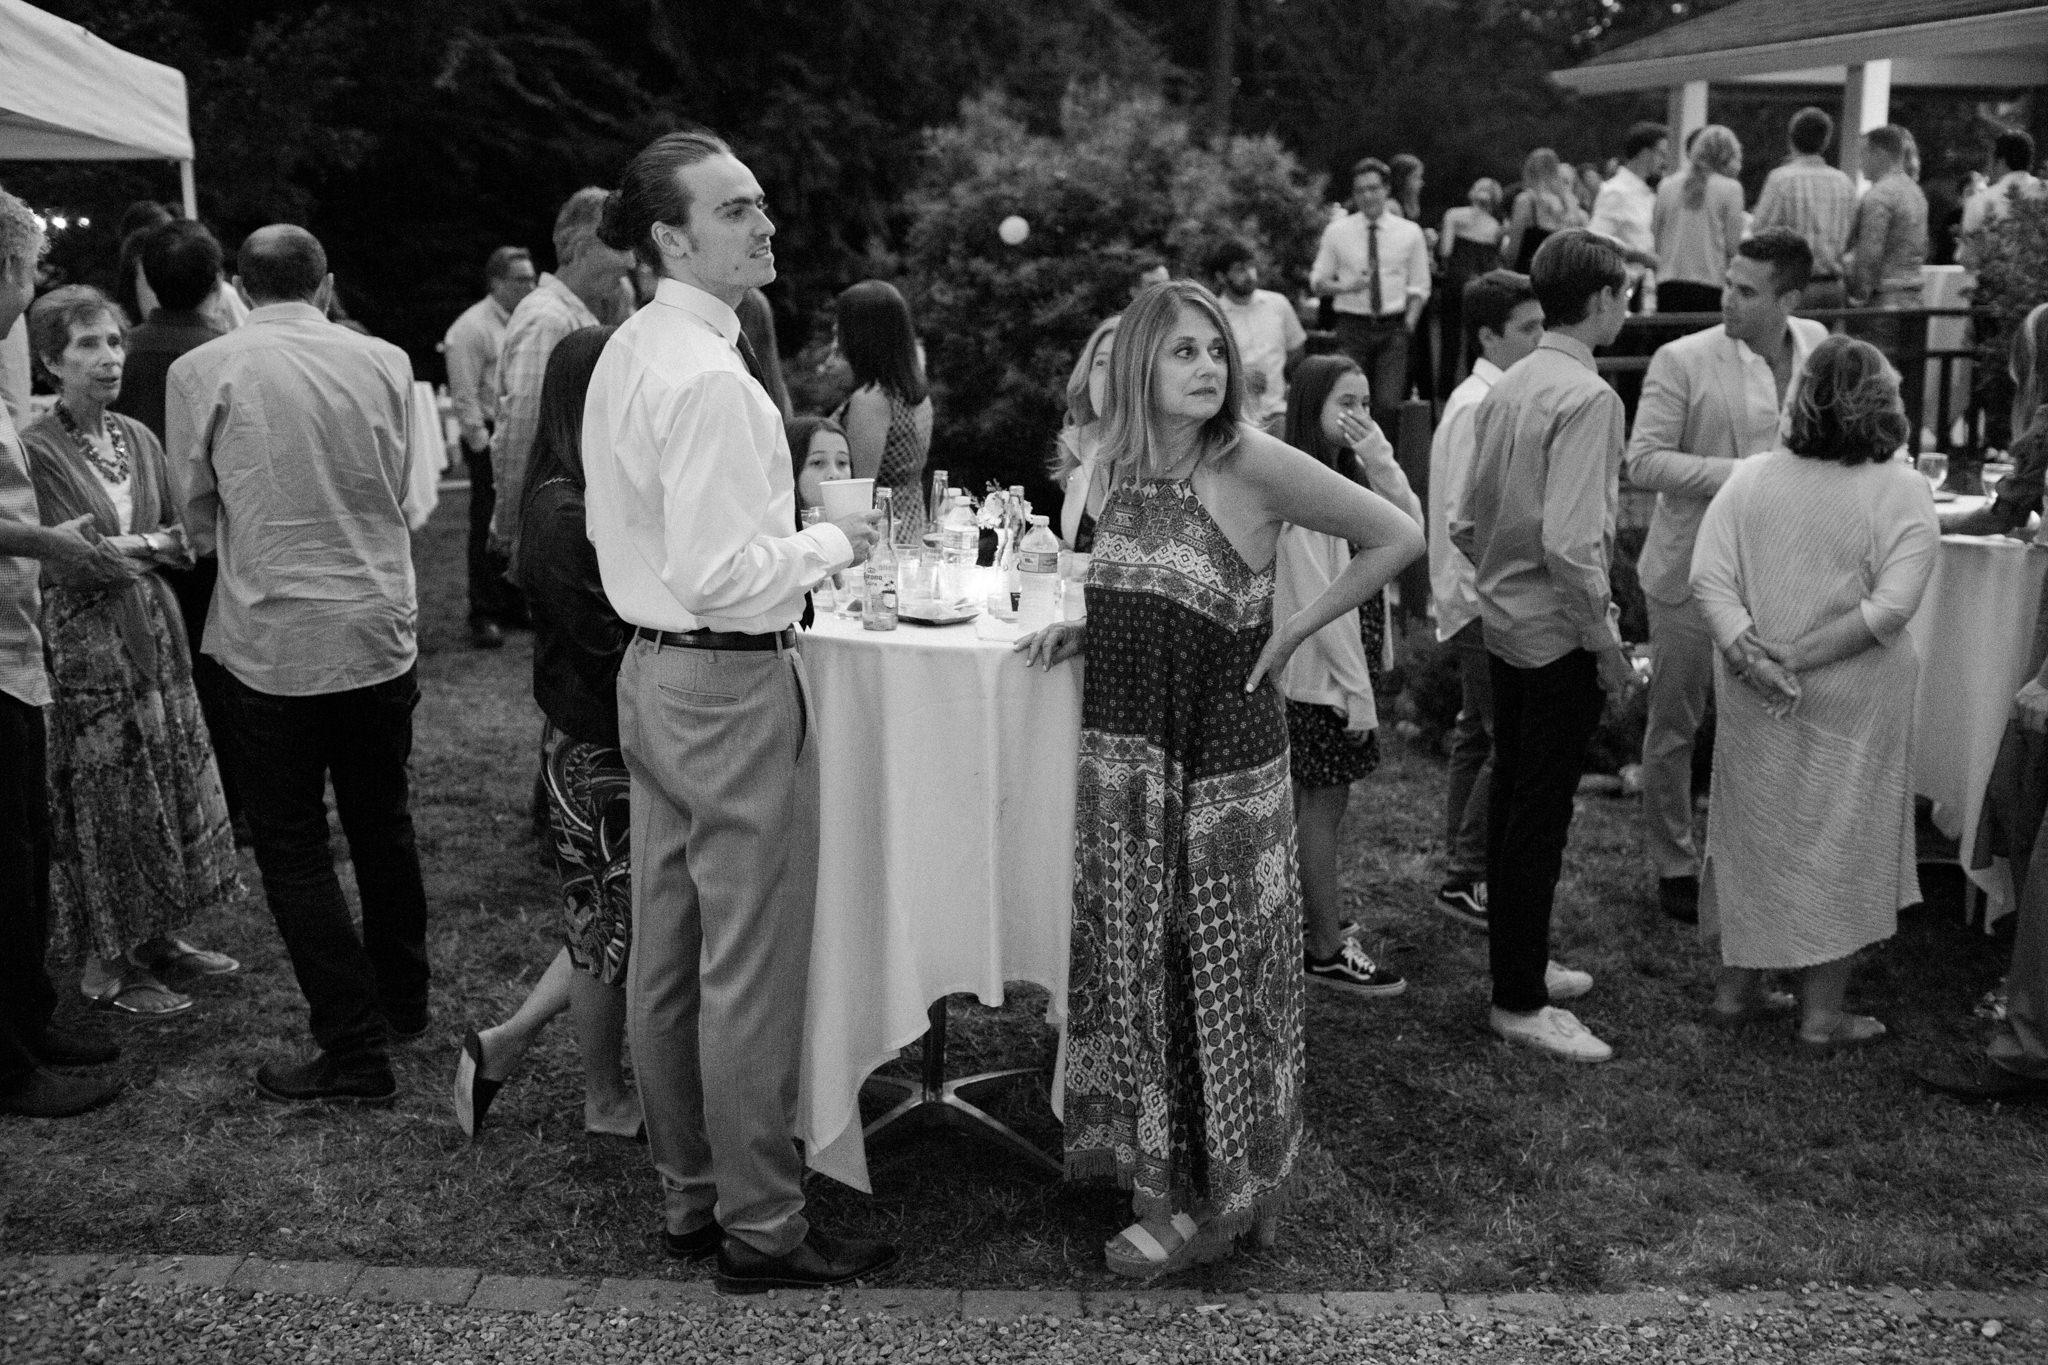 Backyard-Bainbridge-Island-Wedding-Alycia-Lovell-Photography-251.JPG